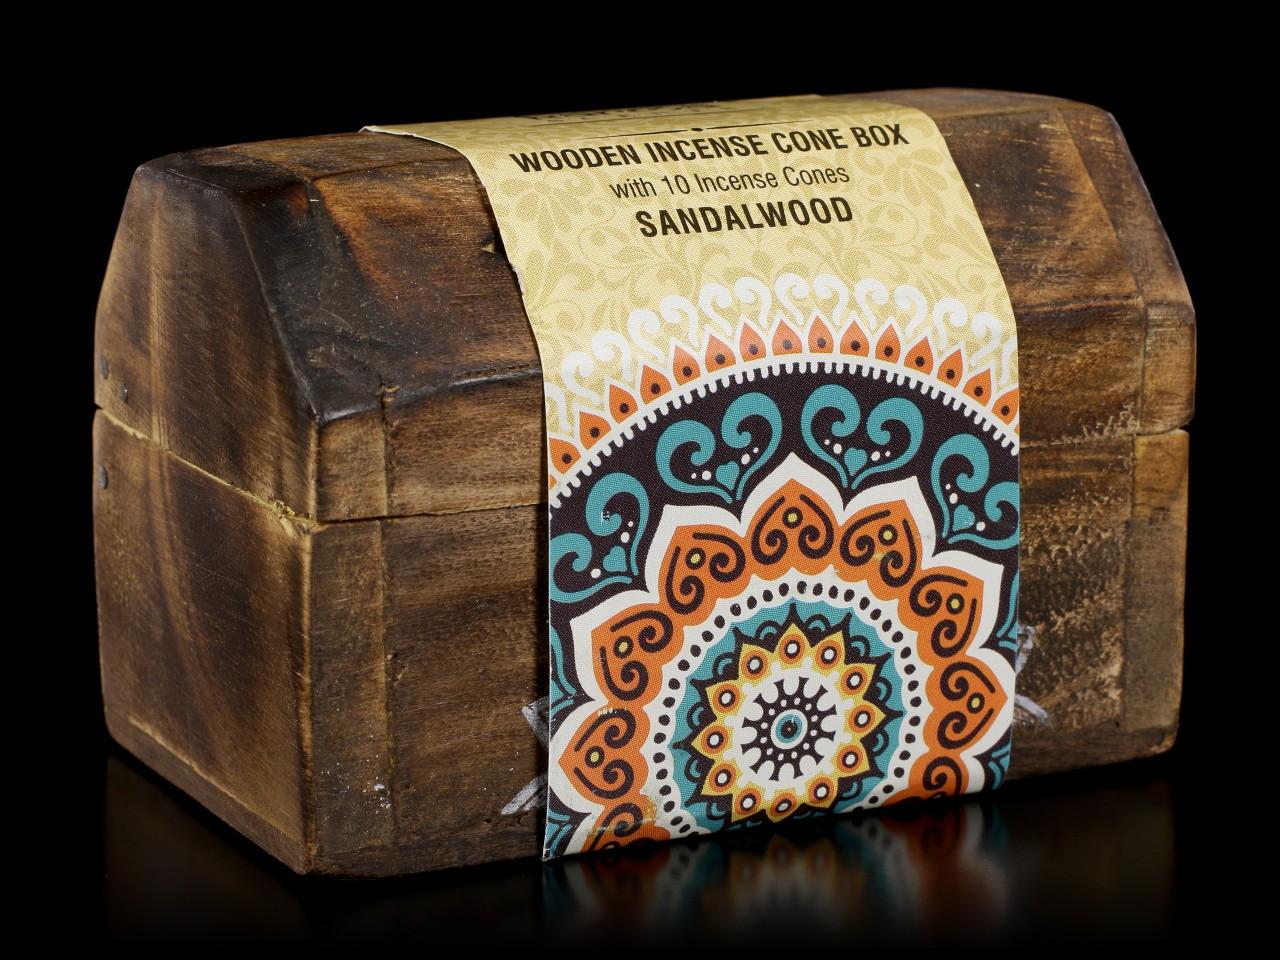 Wooden Incense Cone Box - Sandalwood